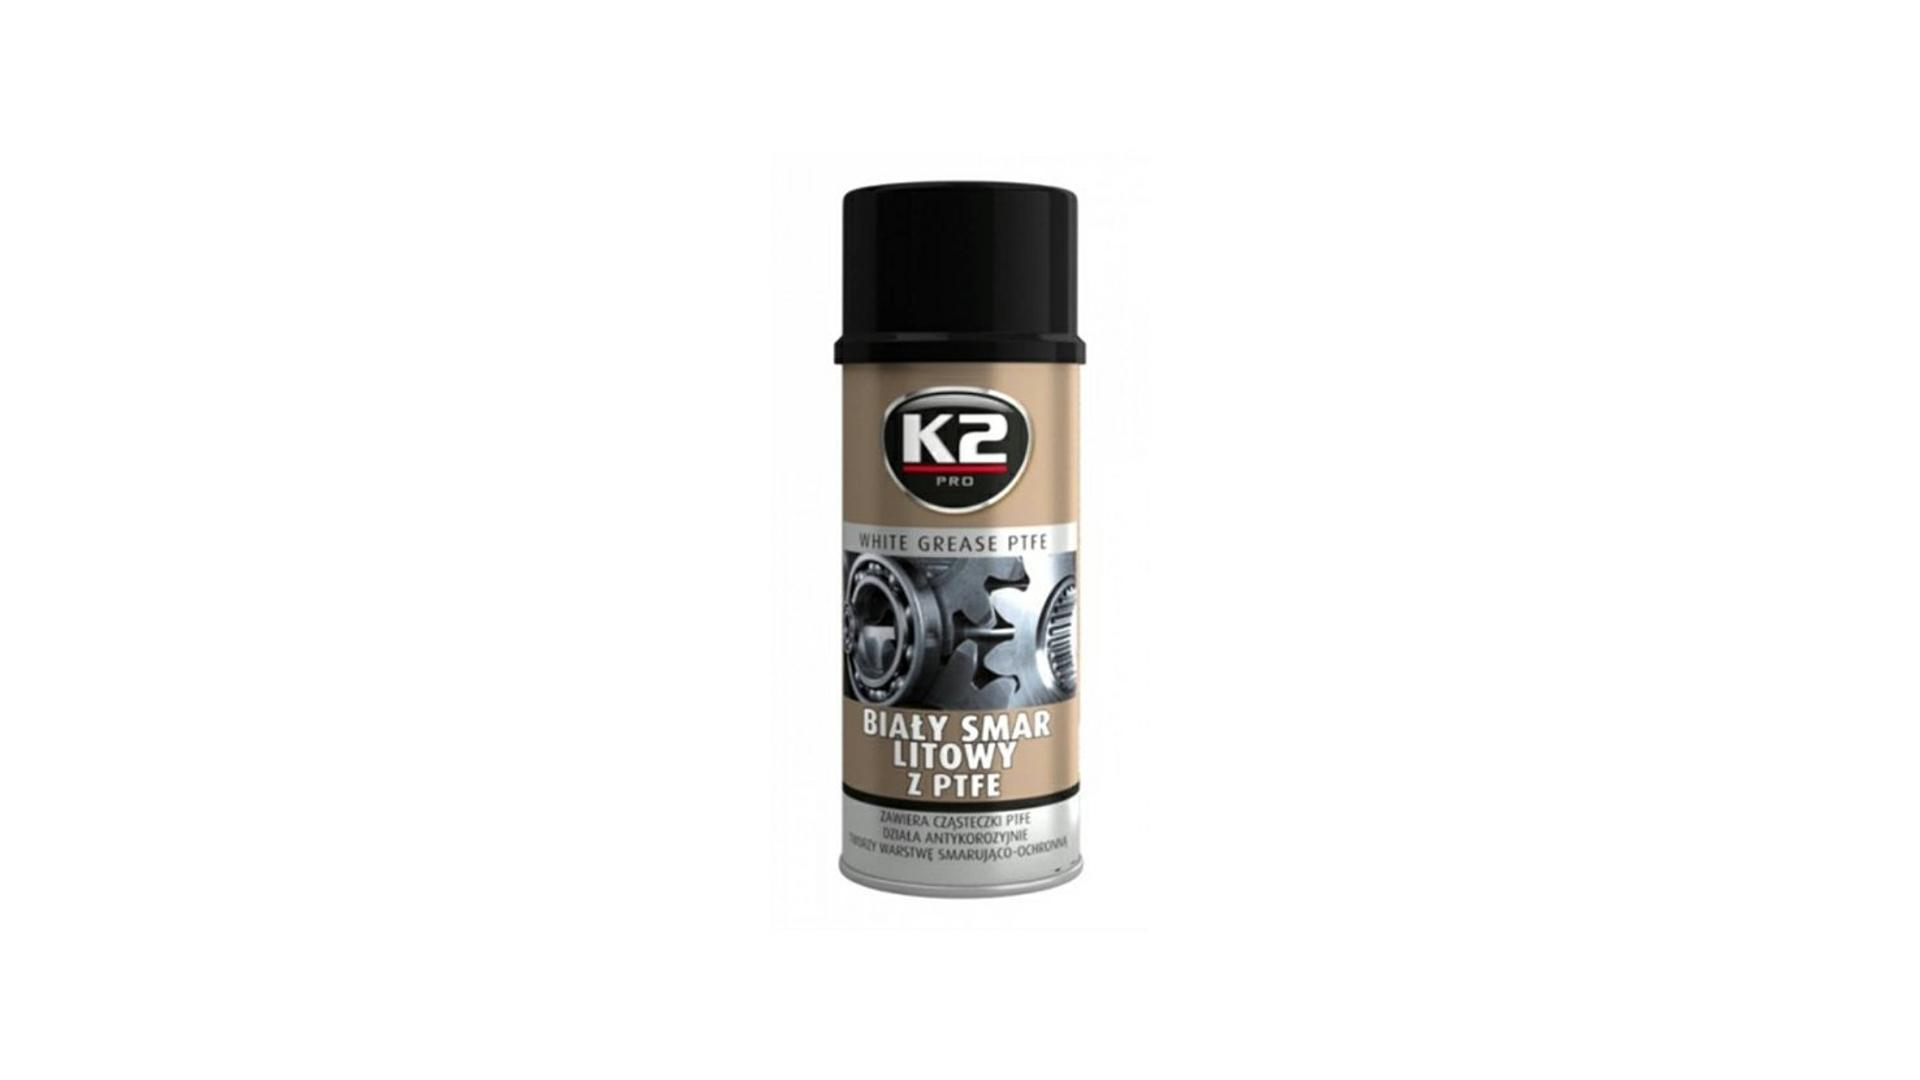 K2 WHITE GREASE PTFE 400ml - aerosolové mazivo na lithiové bázi